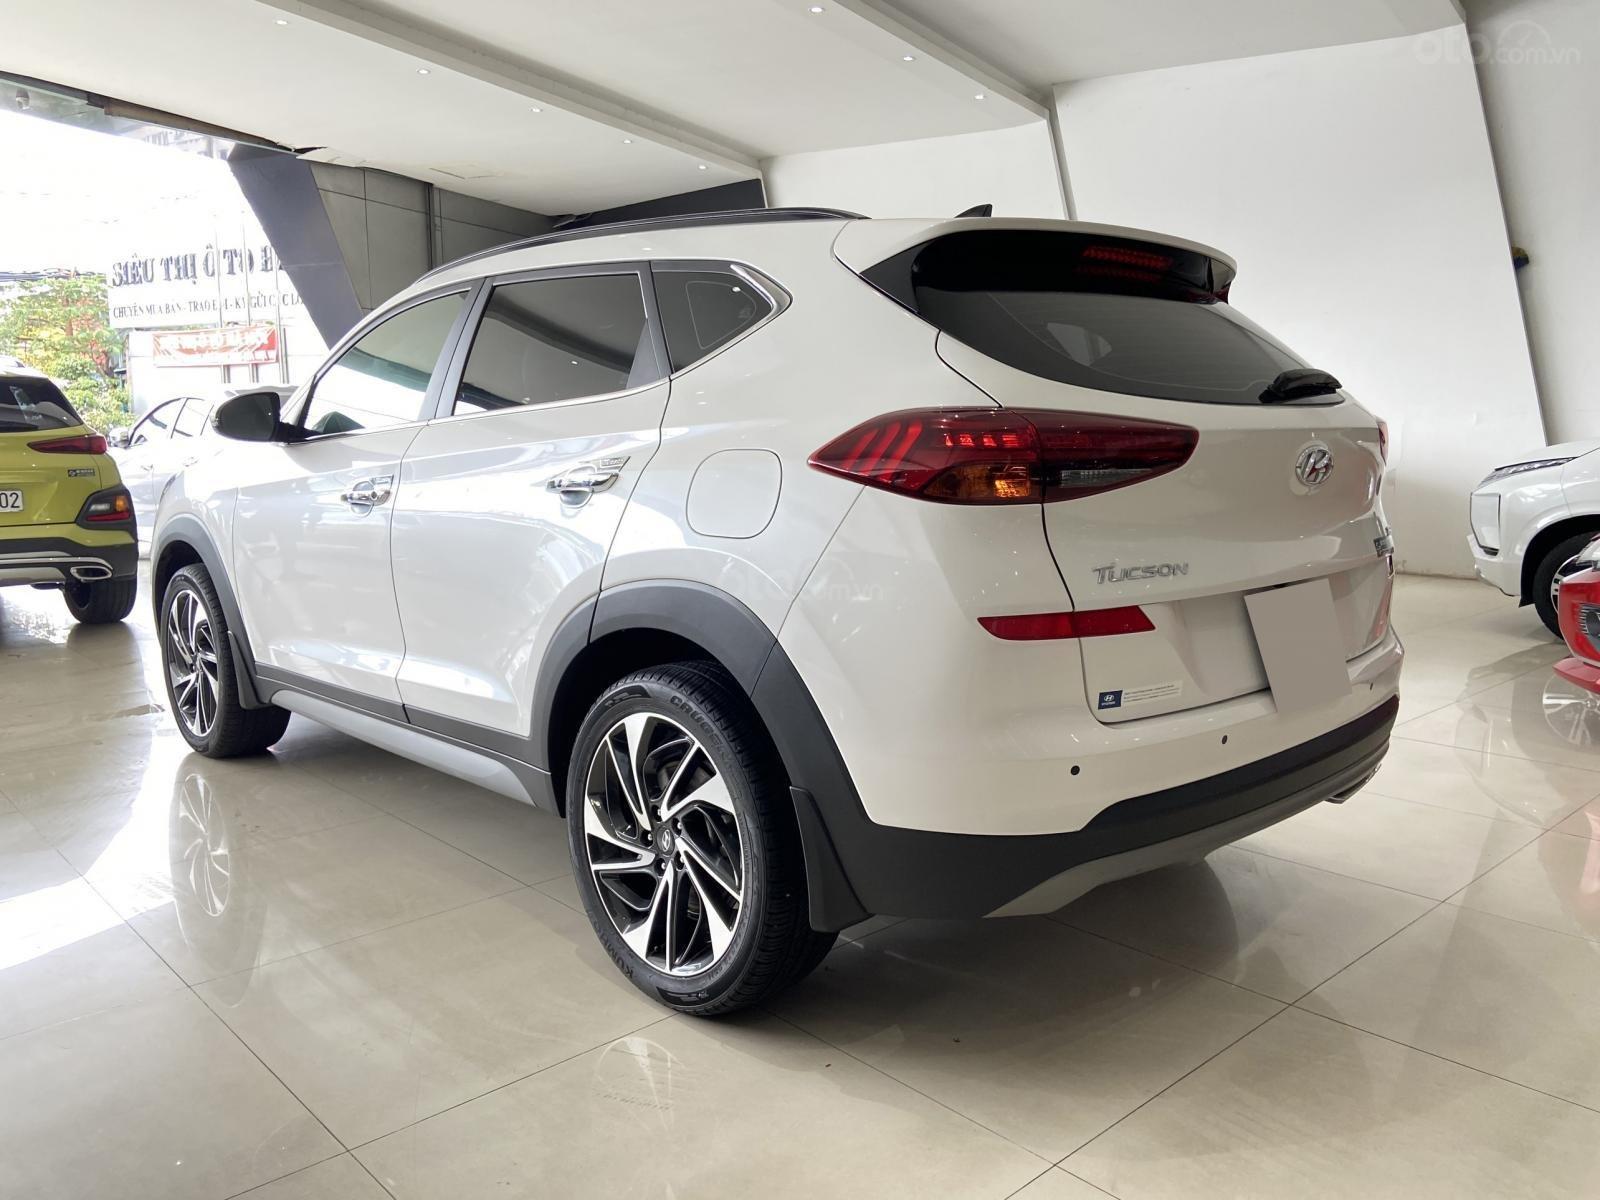 Bán xe Hyundai Tucson AT 1.6 Turbo 2019 (5)